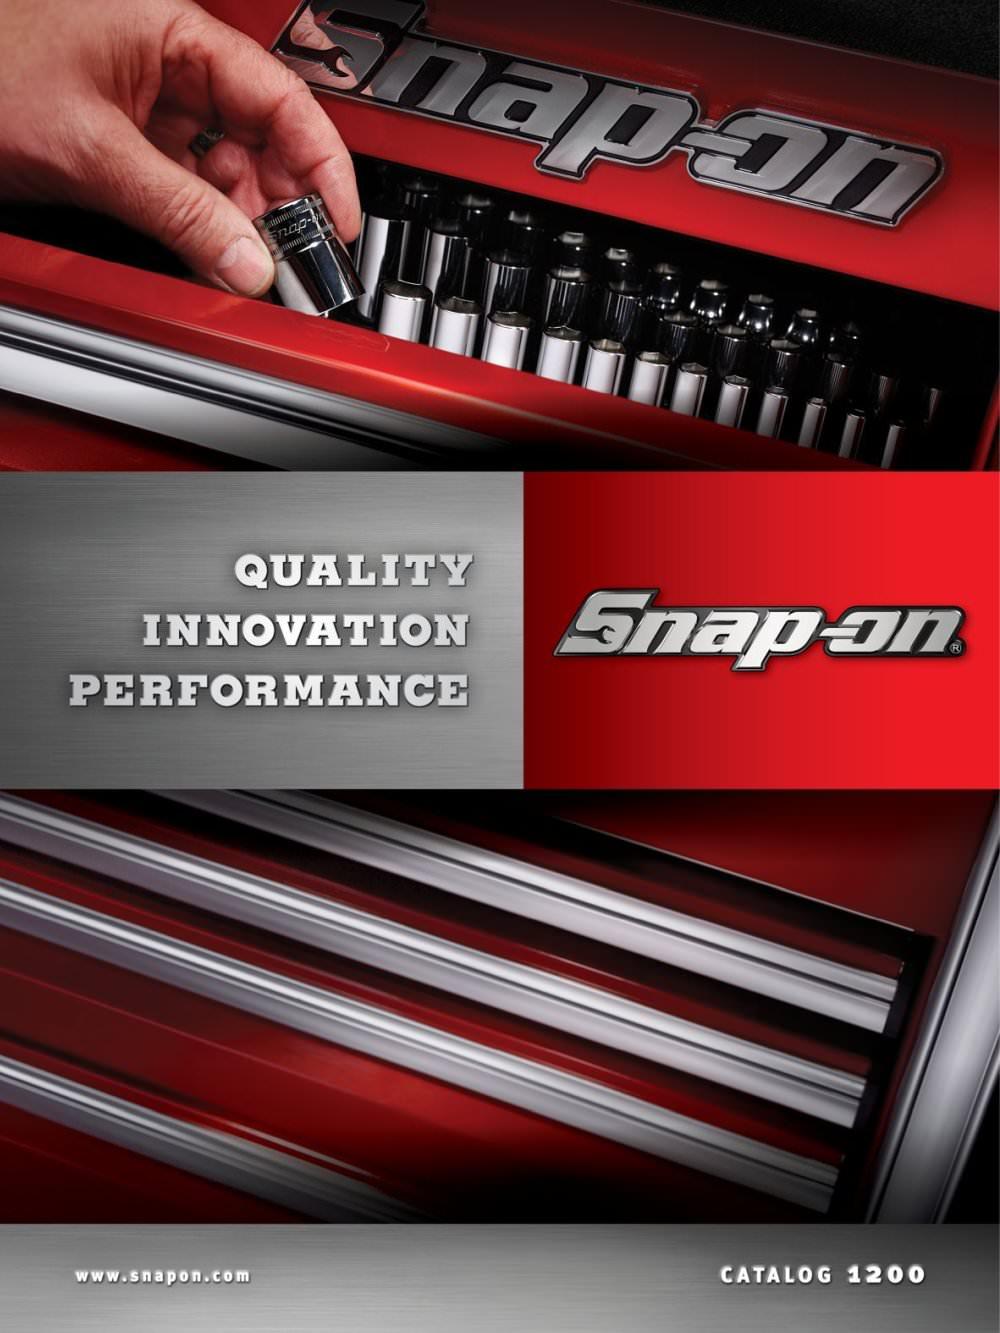 Snap-on Digital Catalog - Snap-on - PDF Catalogs | Technical